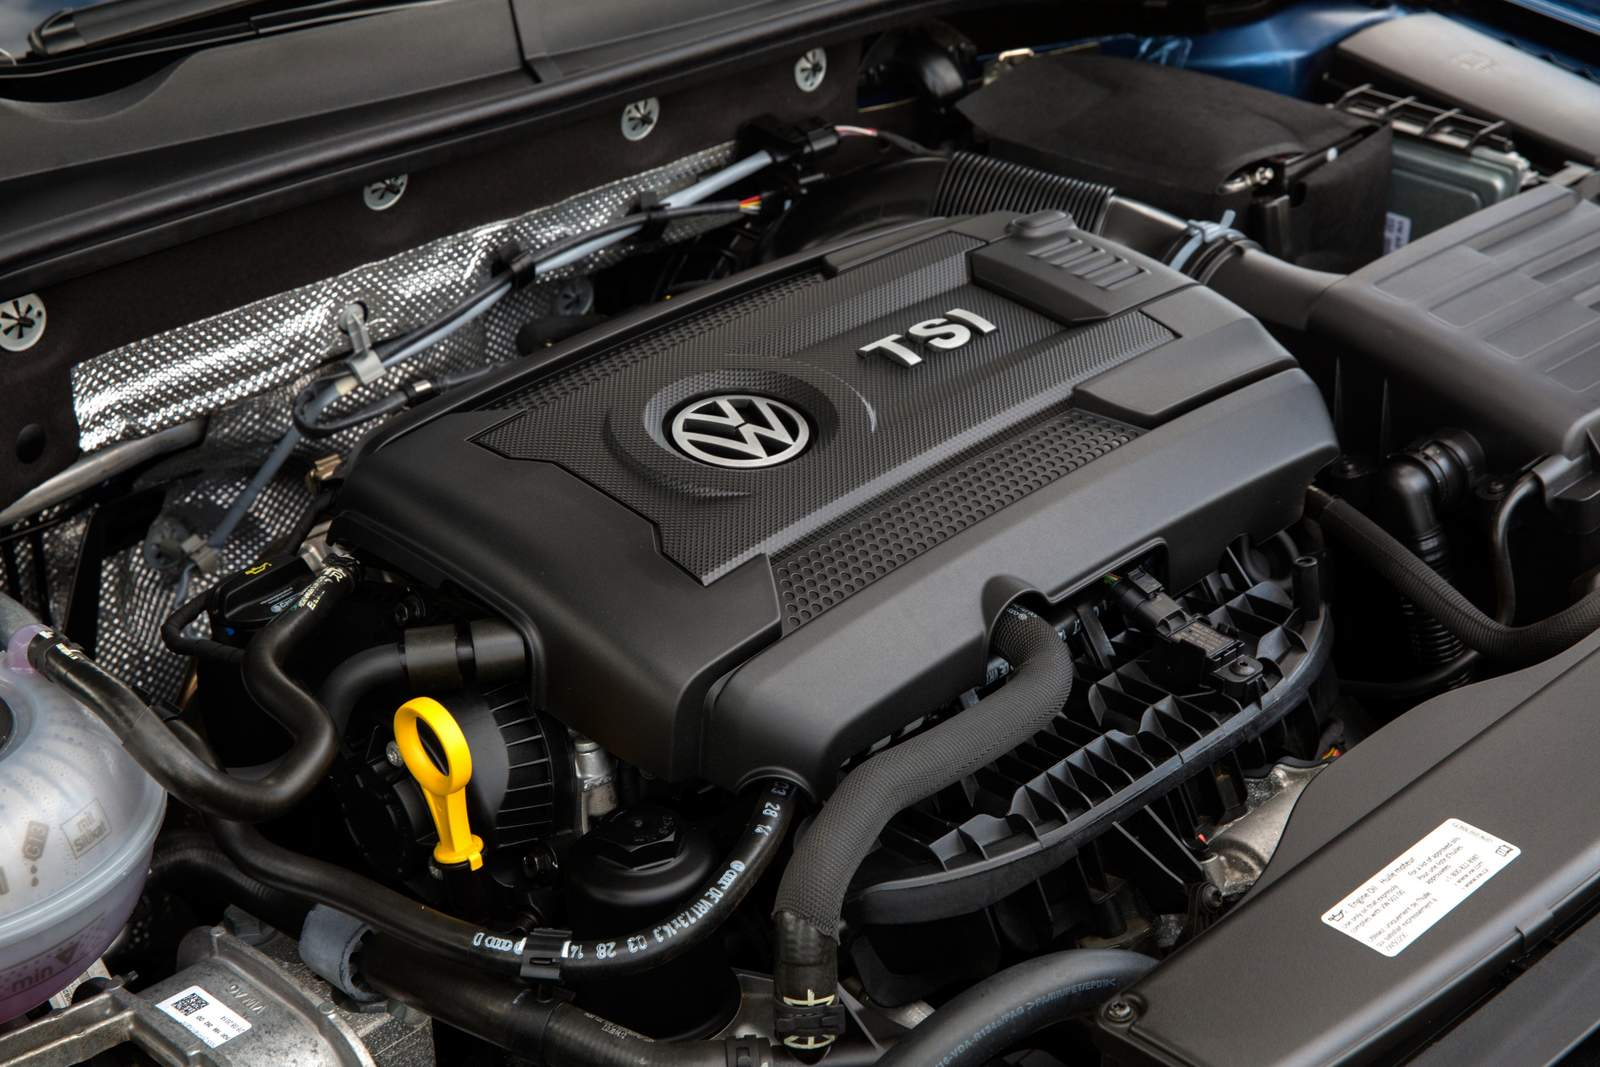 Двигатель 2.0 tsi cawa (1 пок.)   проблемы, масло, тюнинг